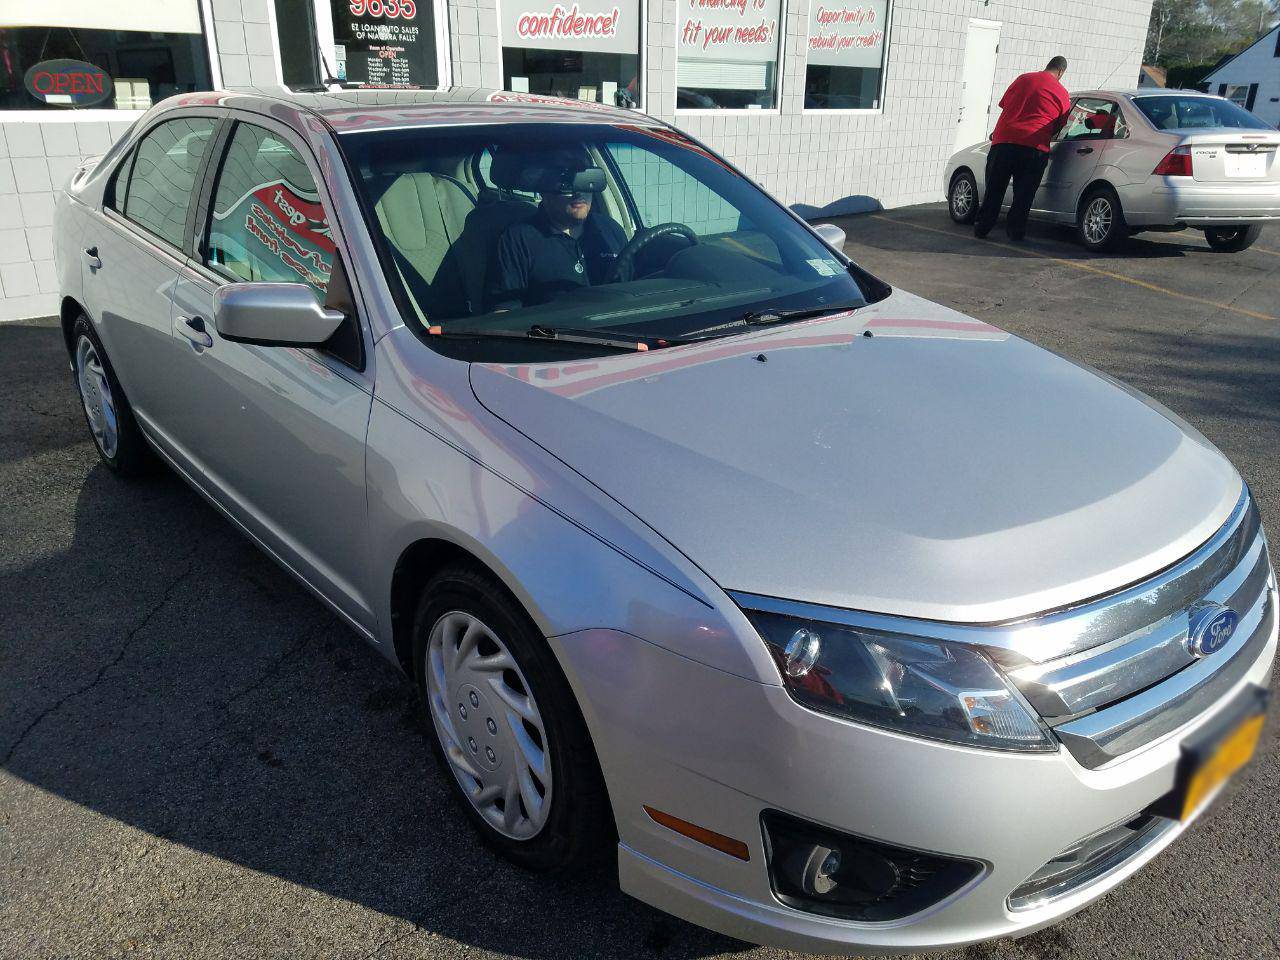 E Z Loan Auto Sales 9635 Niagara Falls Blvd Niagara Falls Ny 14304